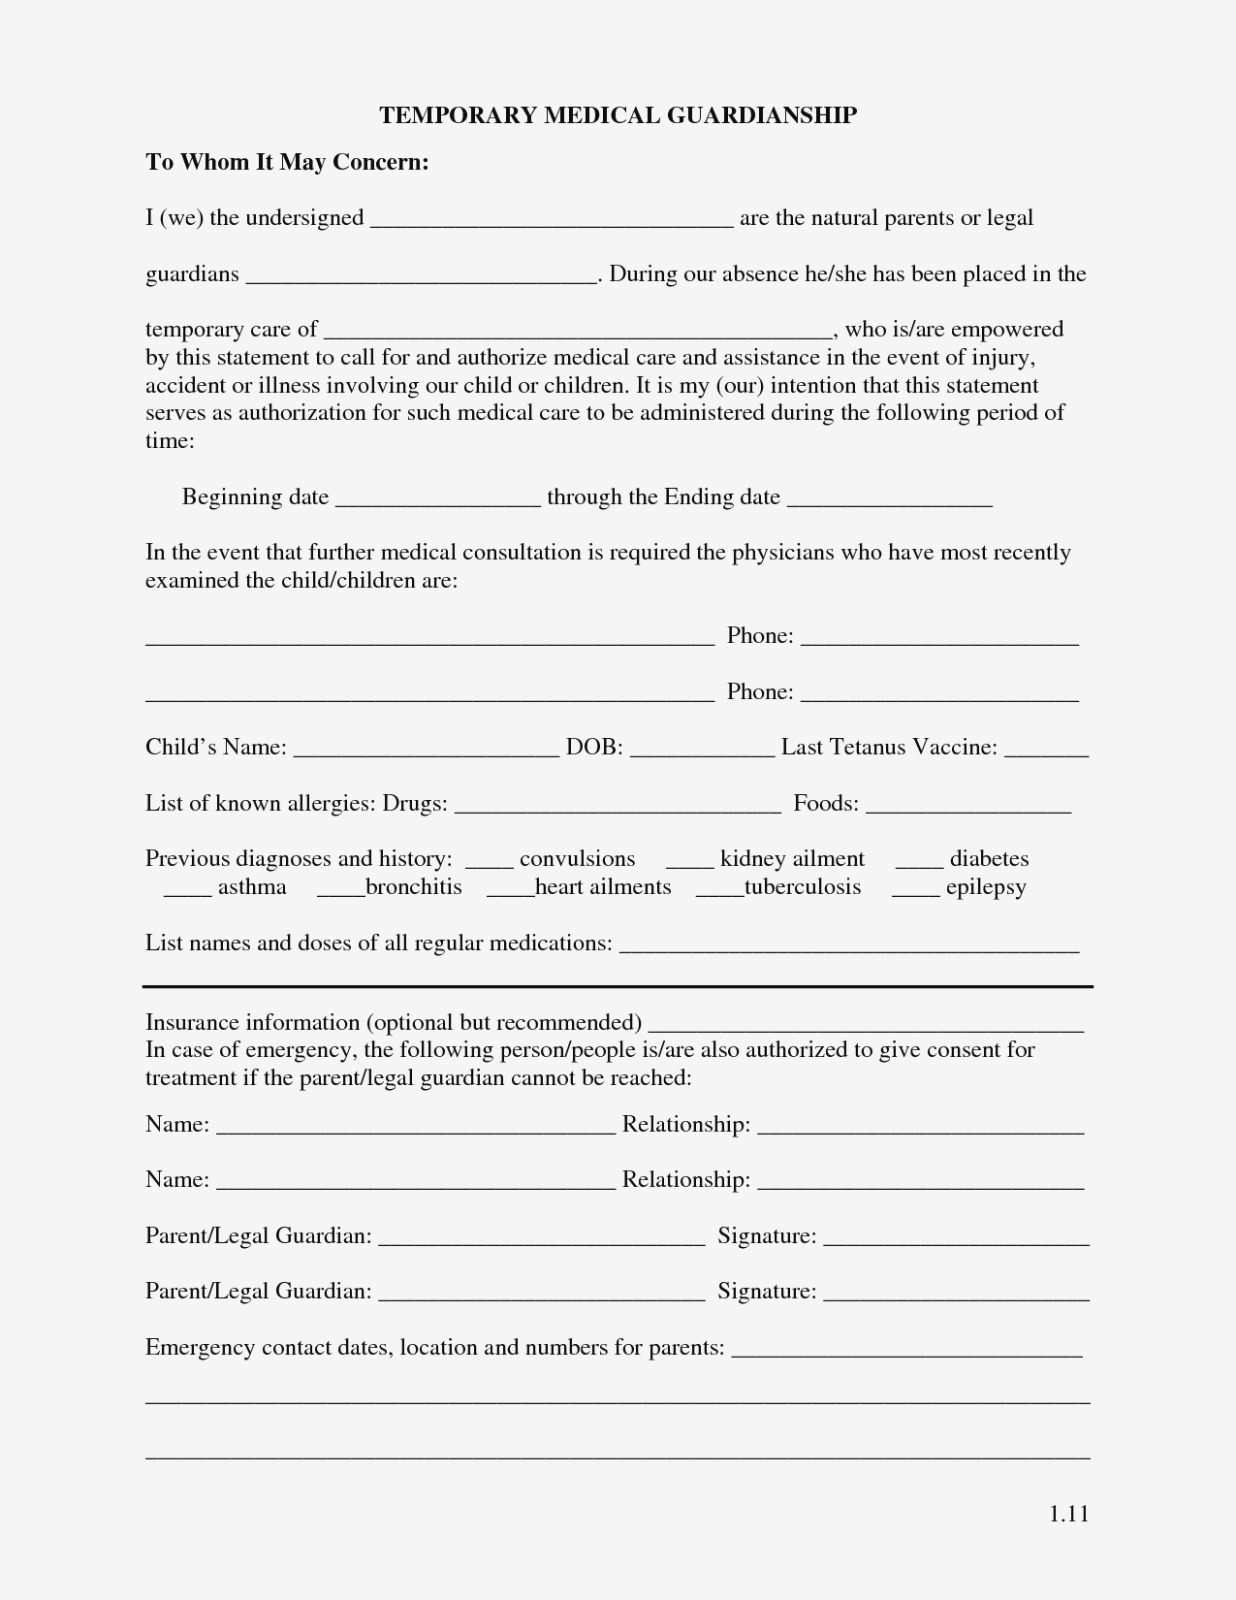 Free Printable Temporary Guardianship Forms | Forms | Pinterest - Free Printable Guardianship Forms